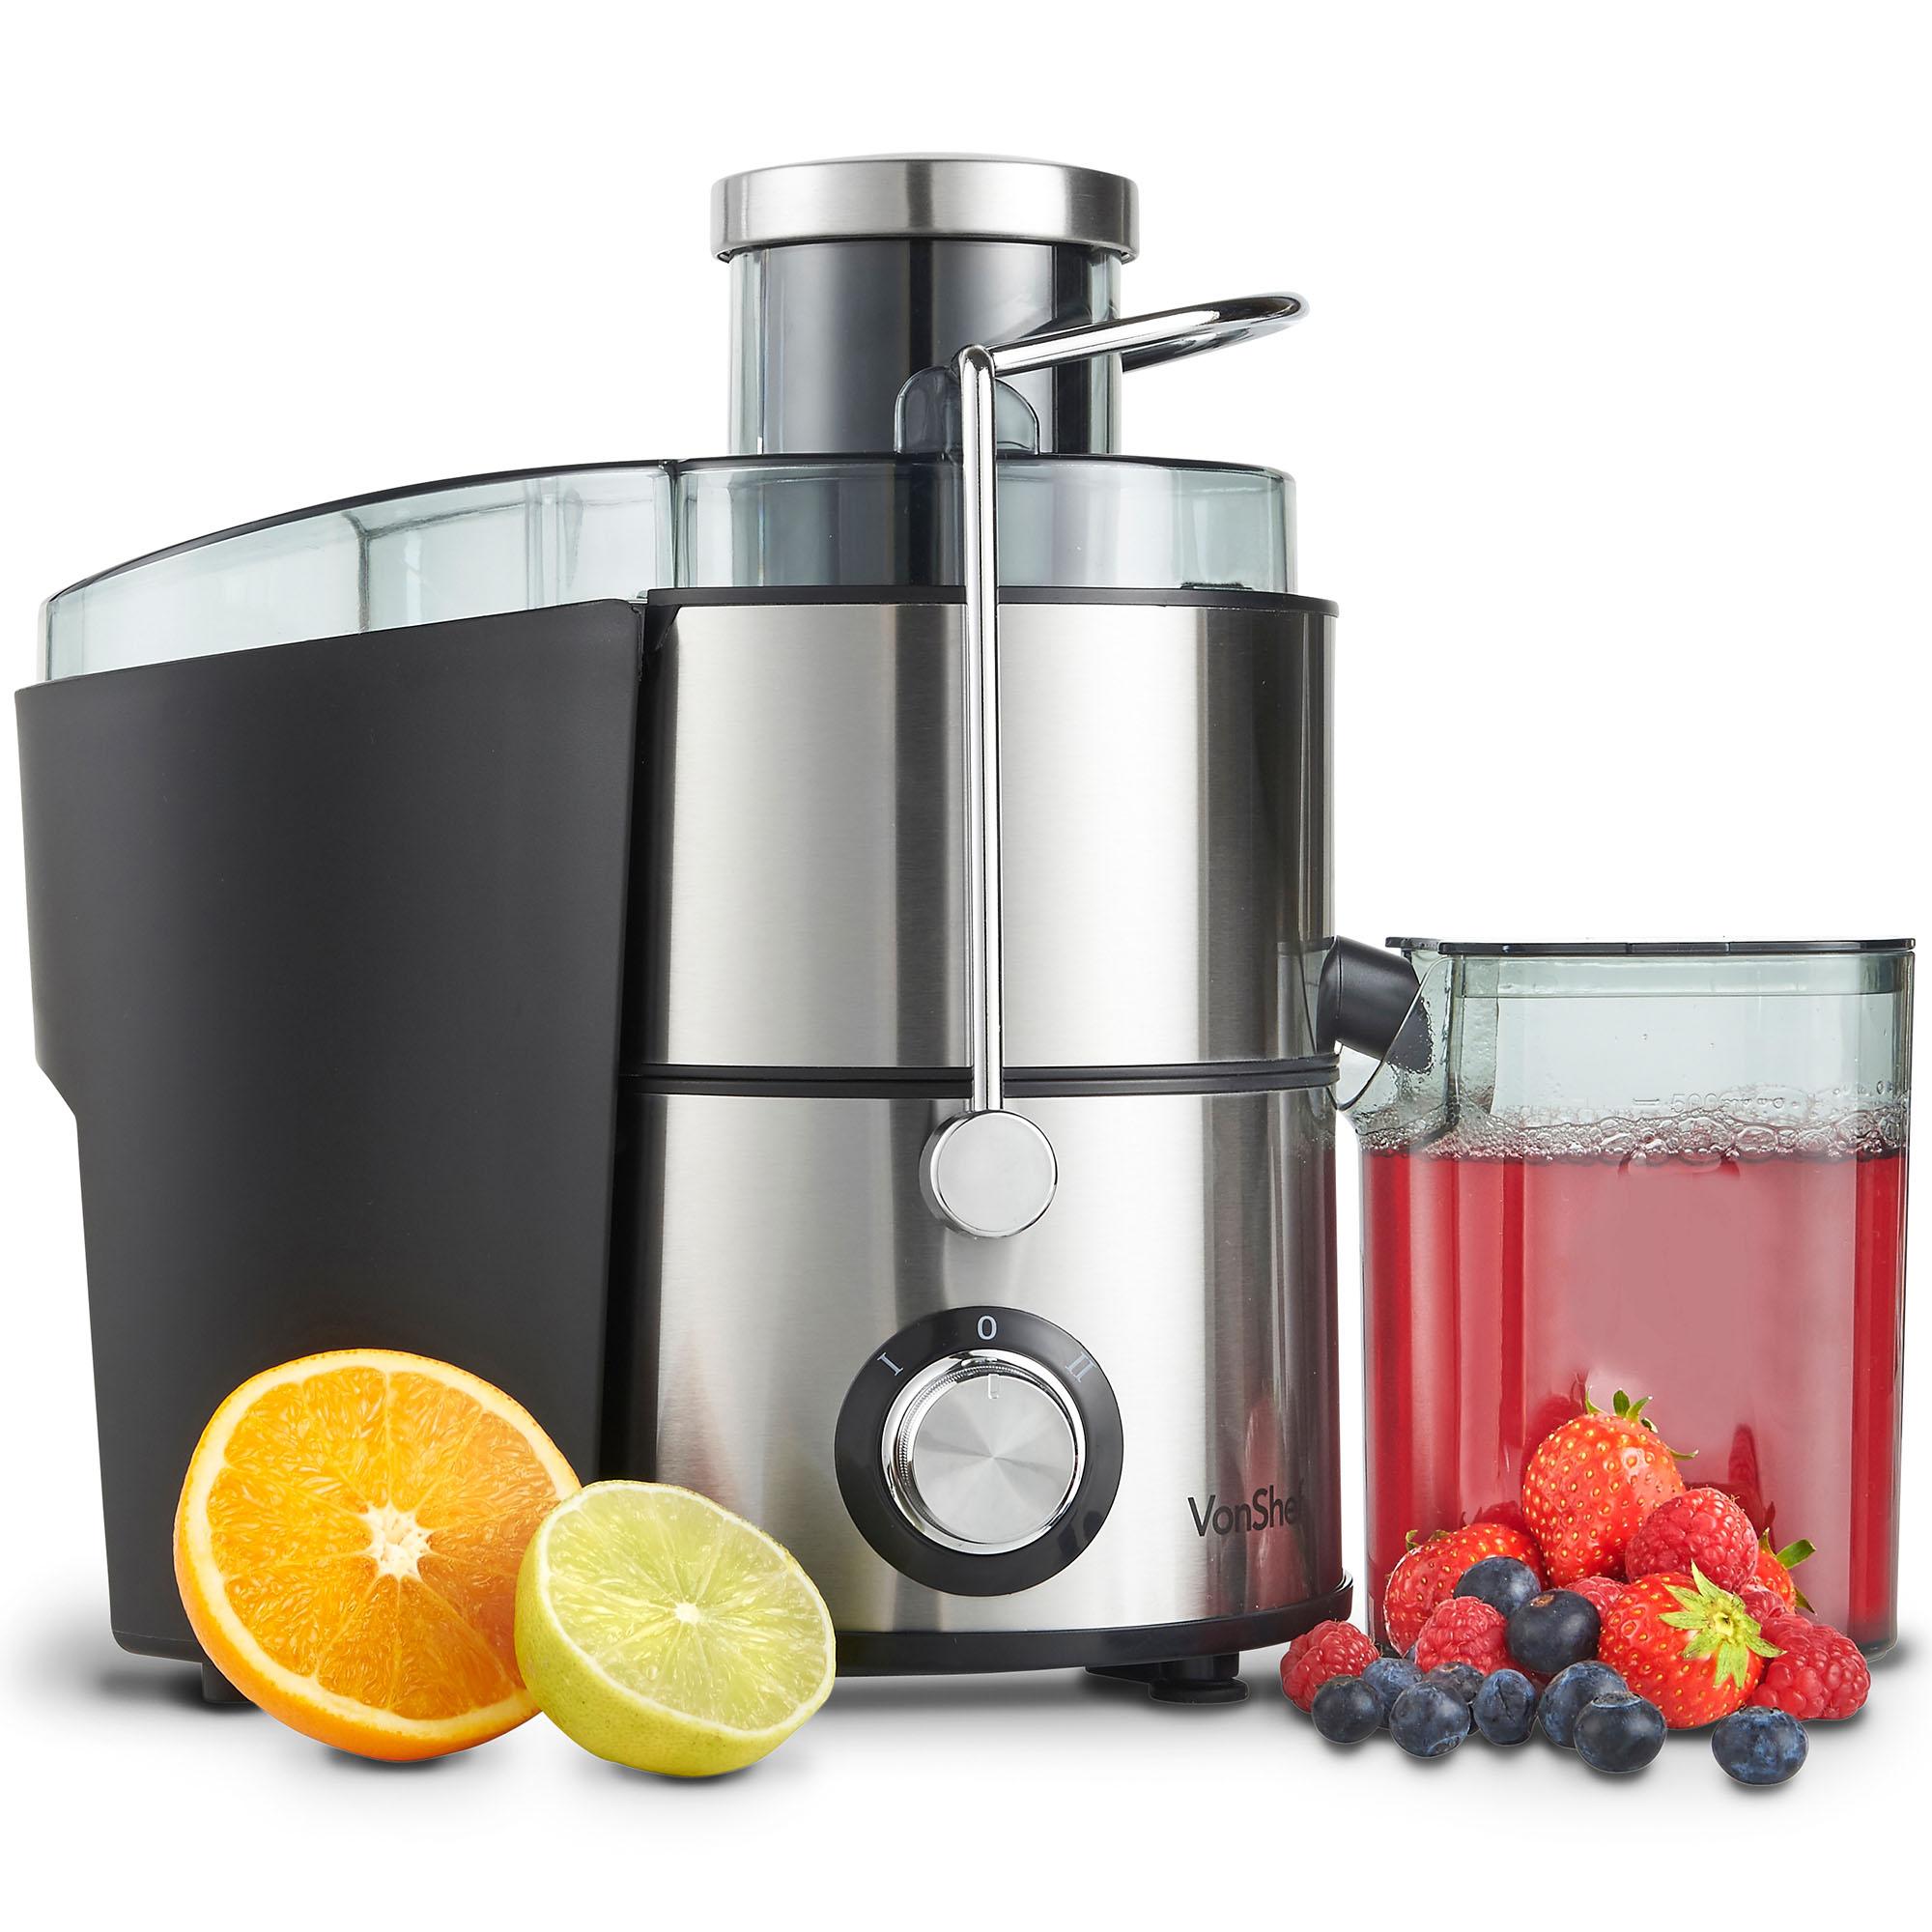 General Electric Juicer ~ Vonshef juicer machine w juice maker powerful whole